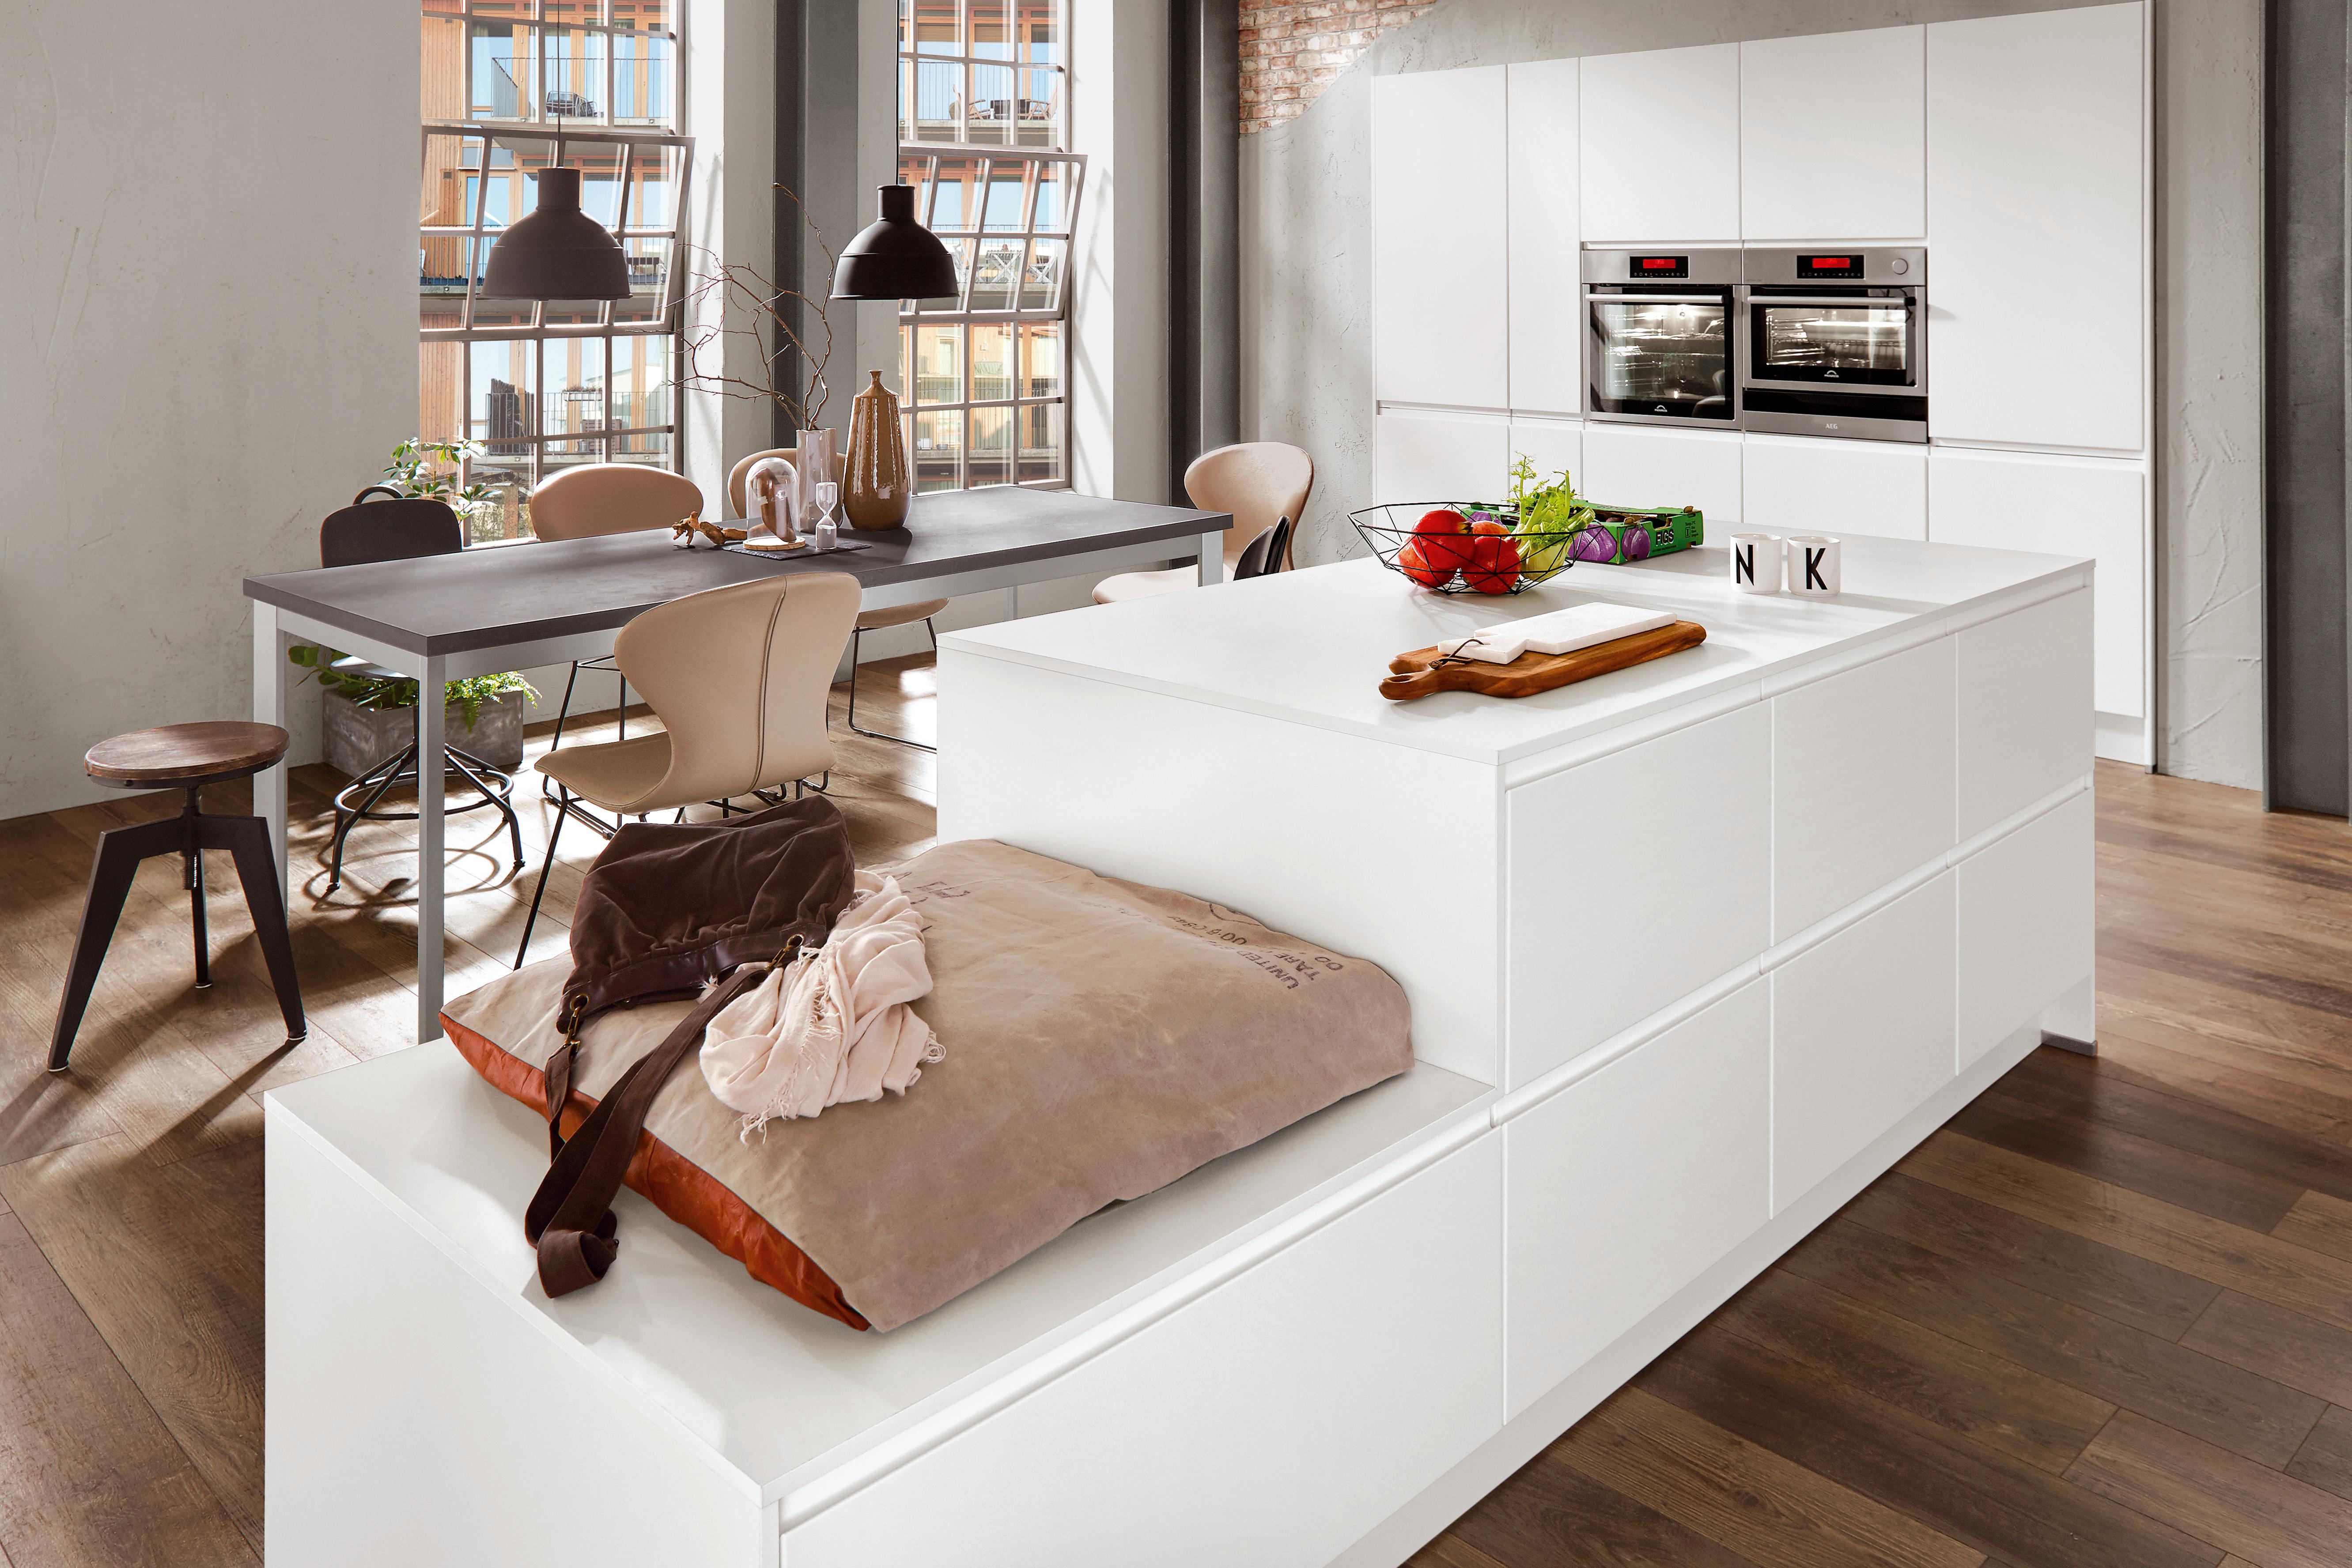 Kitchen Remodeling, Modern Style